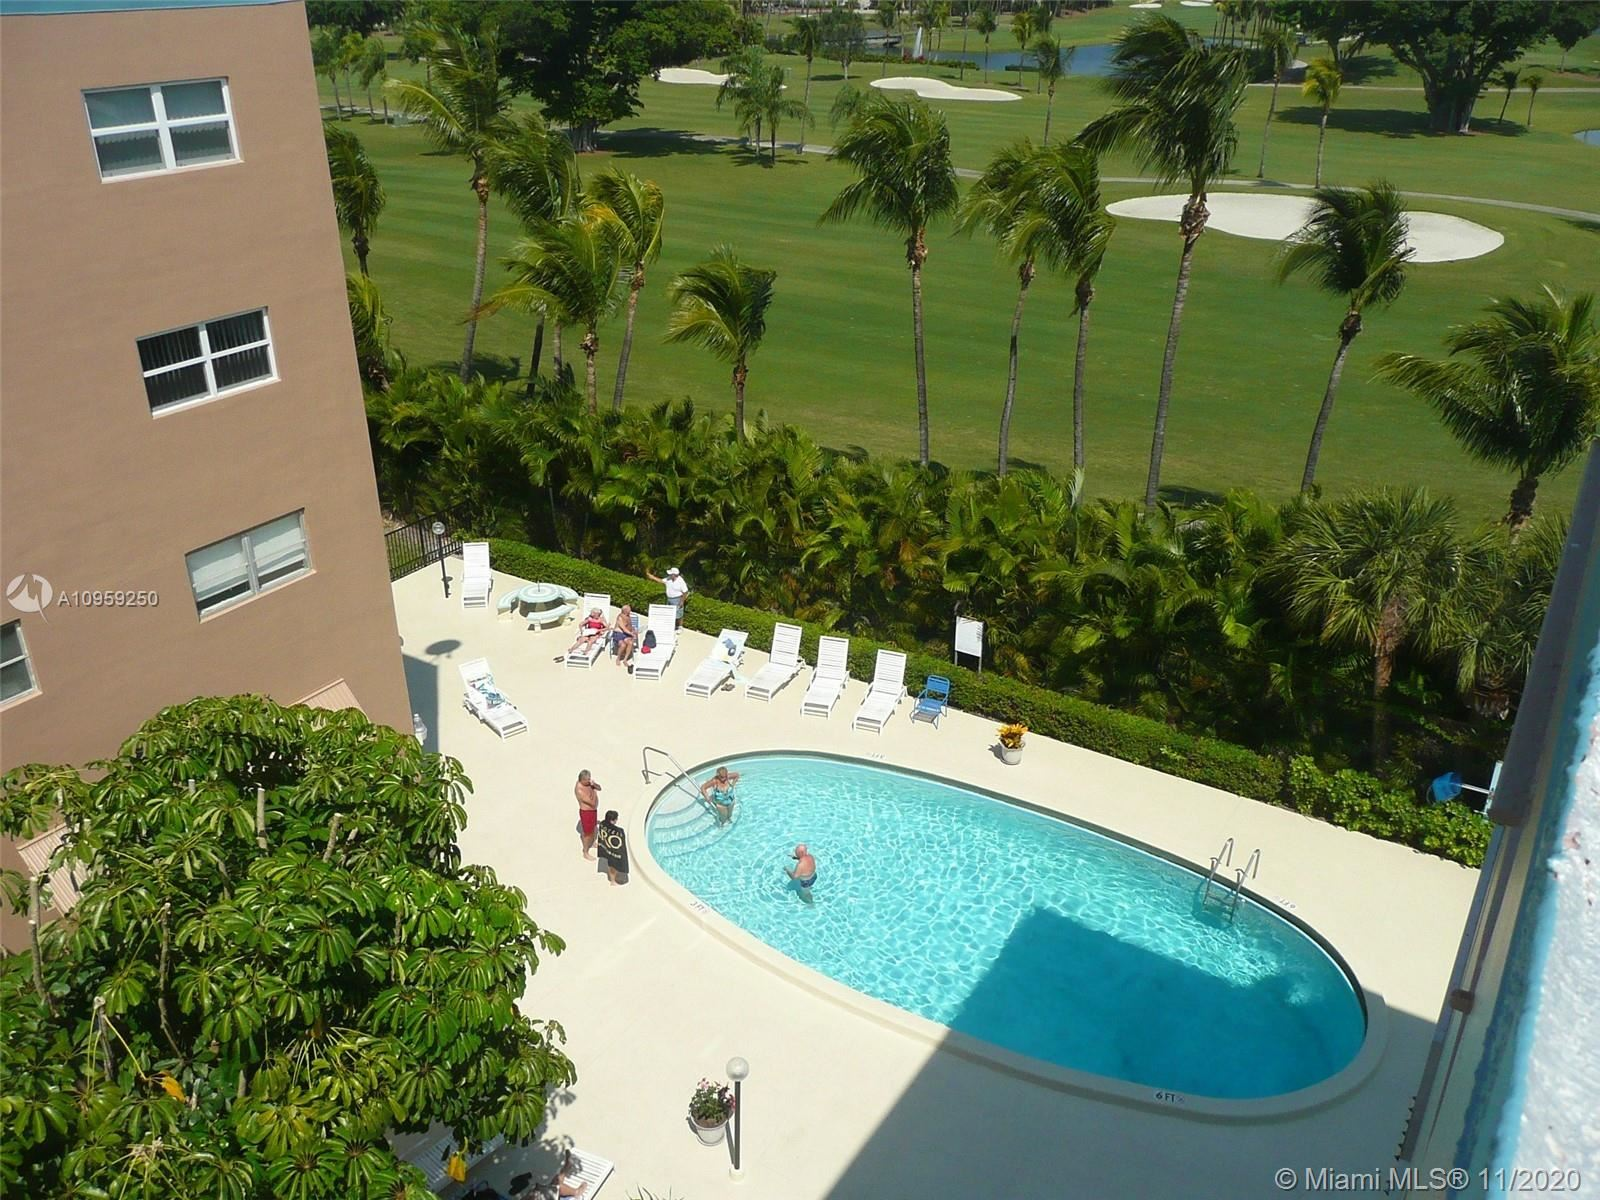 Photo of 200 NE 14th Ave #515, Hallandale Beach, FL 33009 (MLS # A10959250)